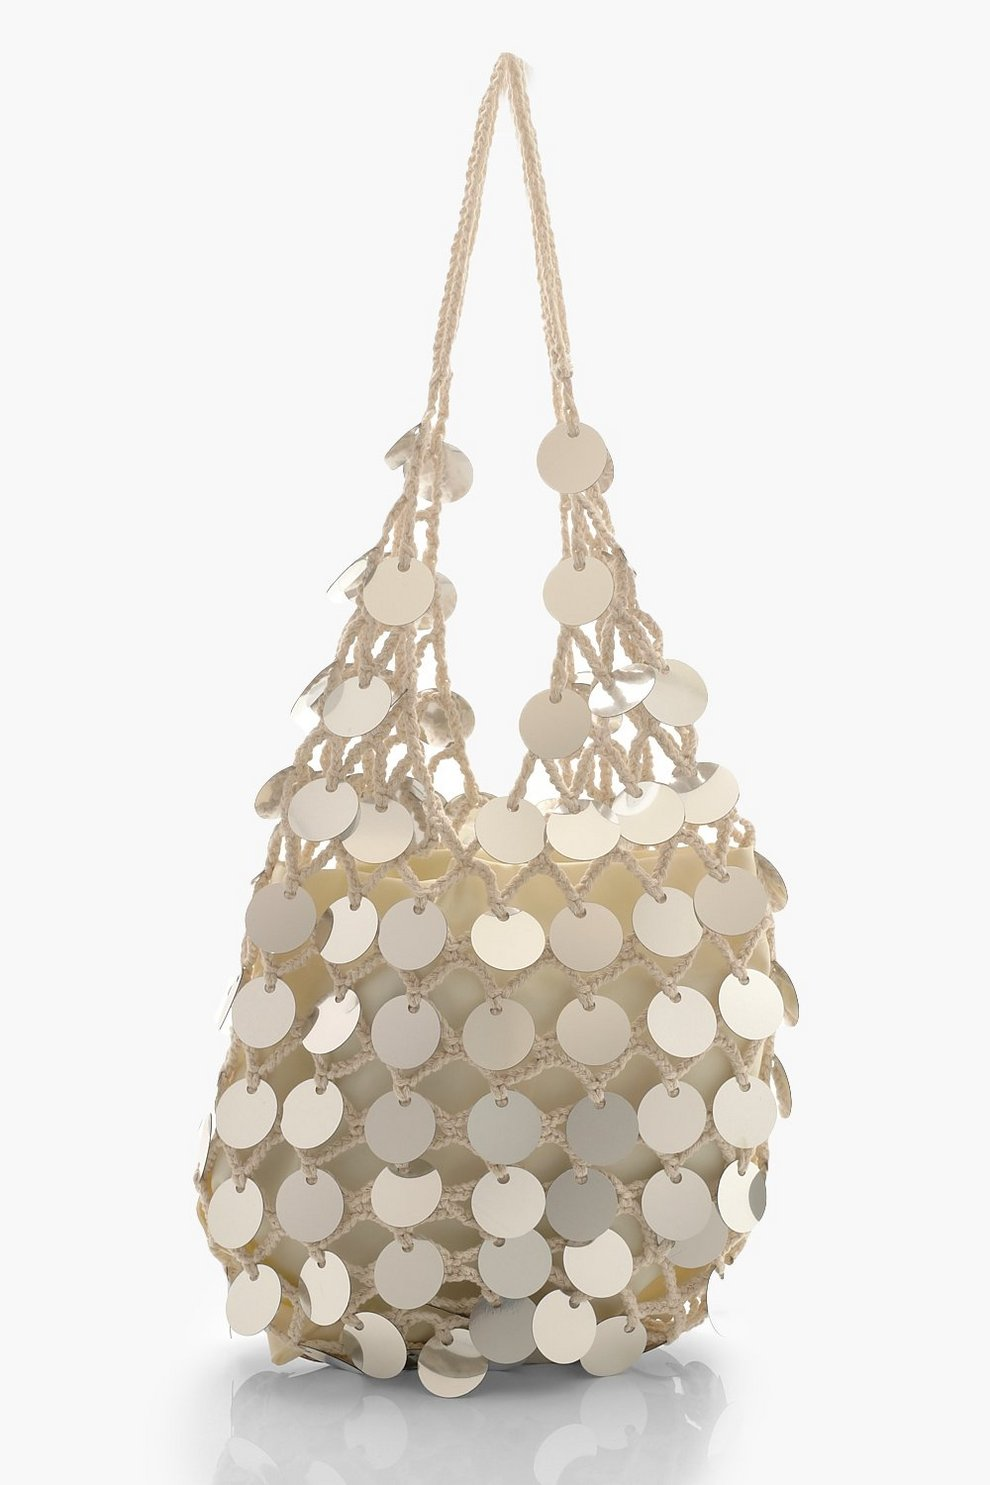 6f4a0c7c4a Handmade Sequin Crochet Beach Bag   Boohoo